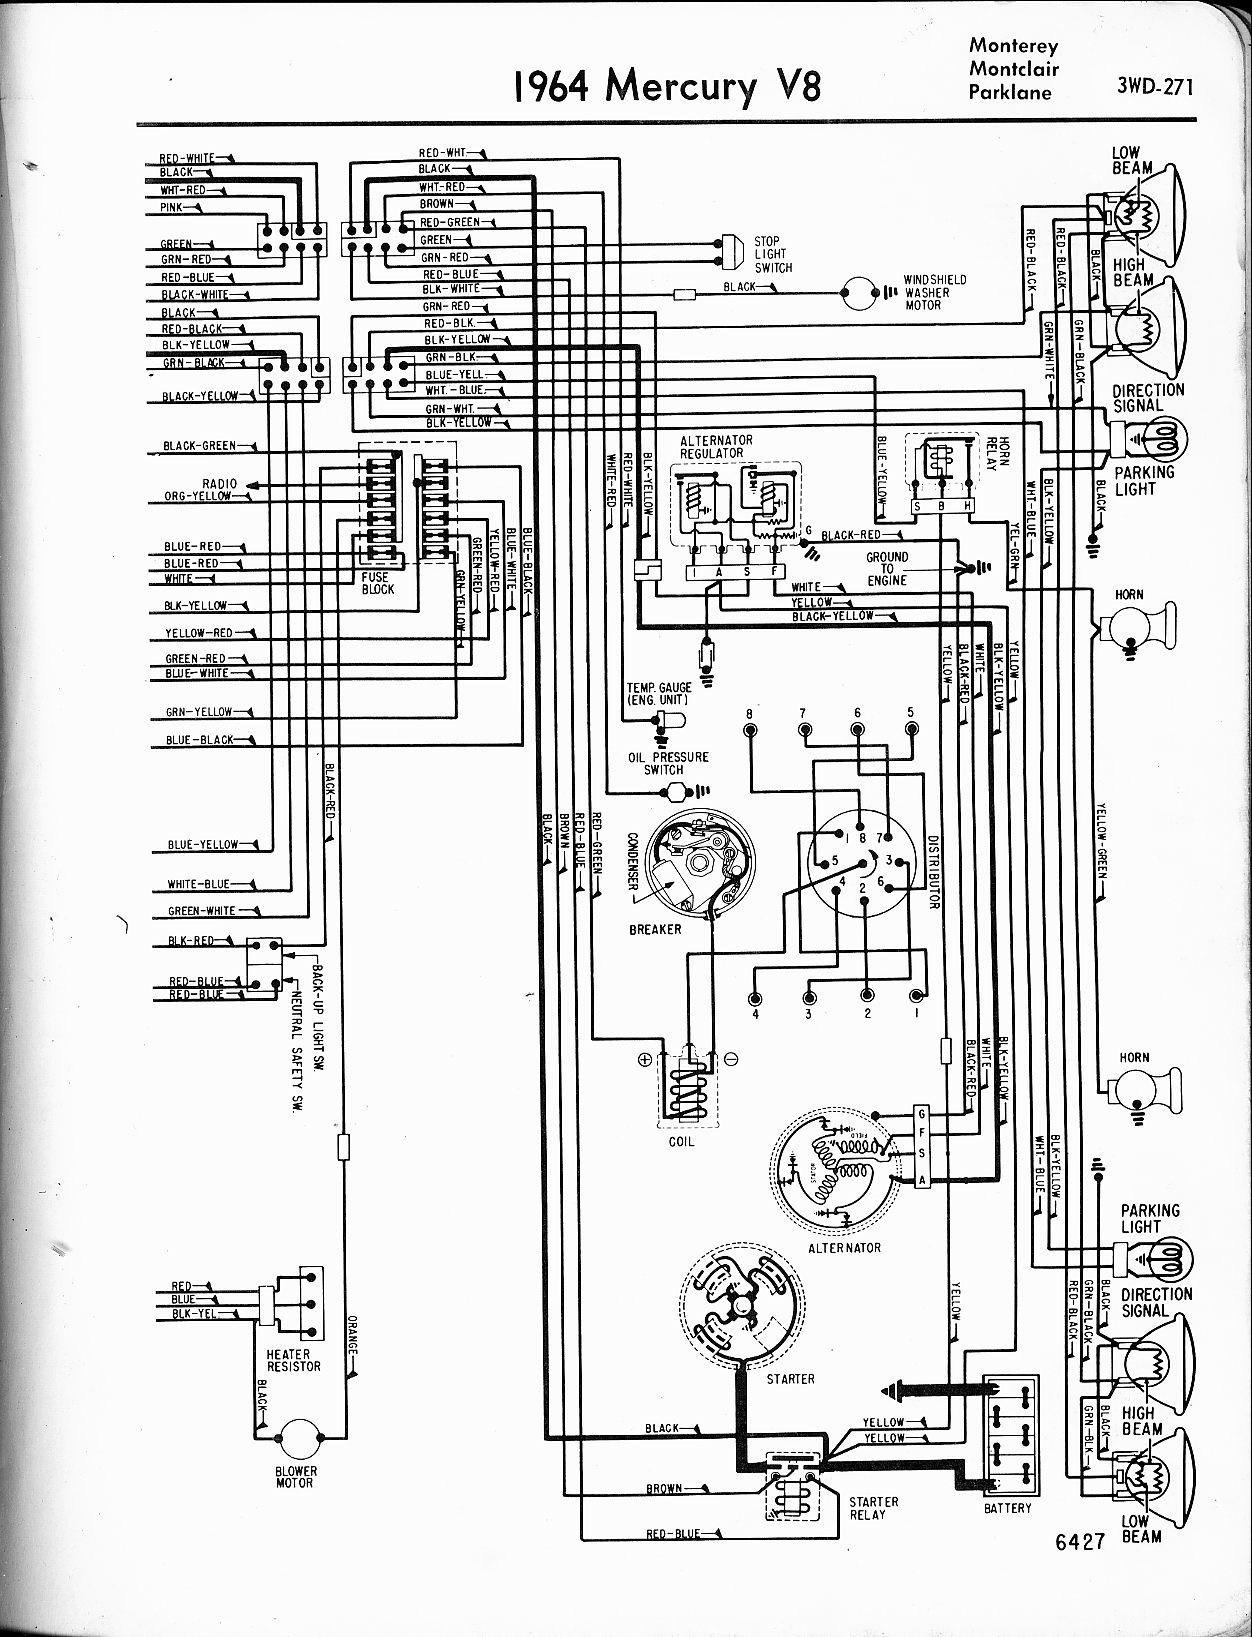 indmar engine diagram carbonvote mudit blog \u2022indmar wiring harness diagram 9 12 jaun bergbahnen de u2022 rh 9 12 jaun bergbahnen de indmar 350 engine diagram indmar marine engine wiring diagram